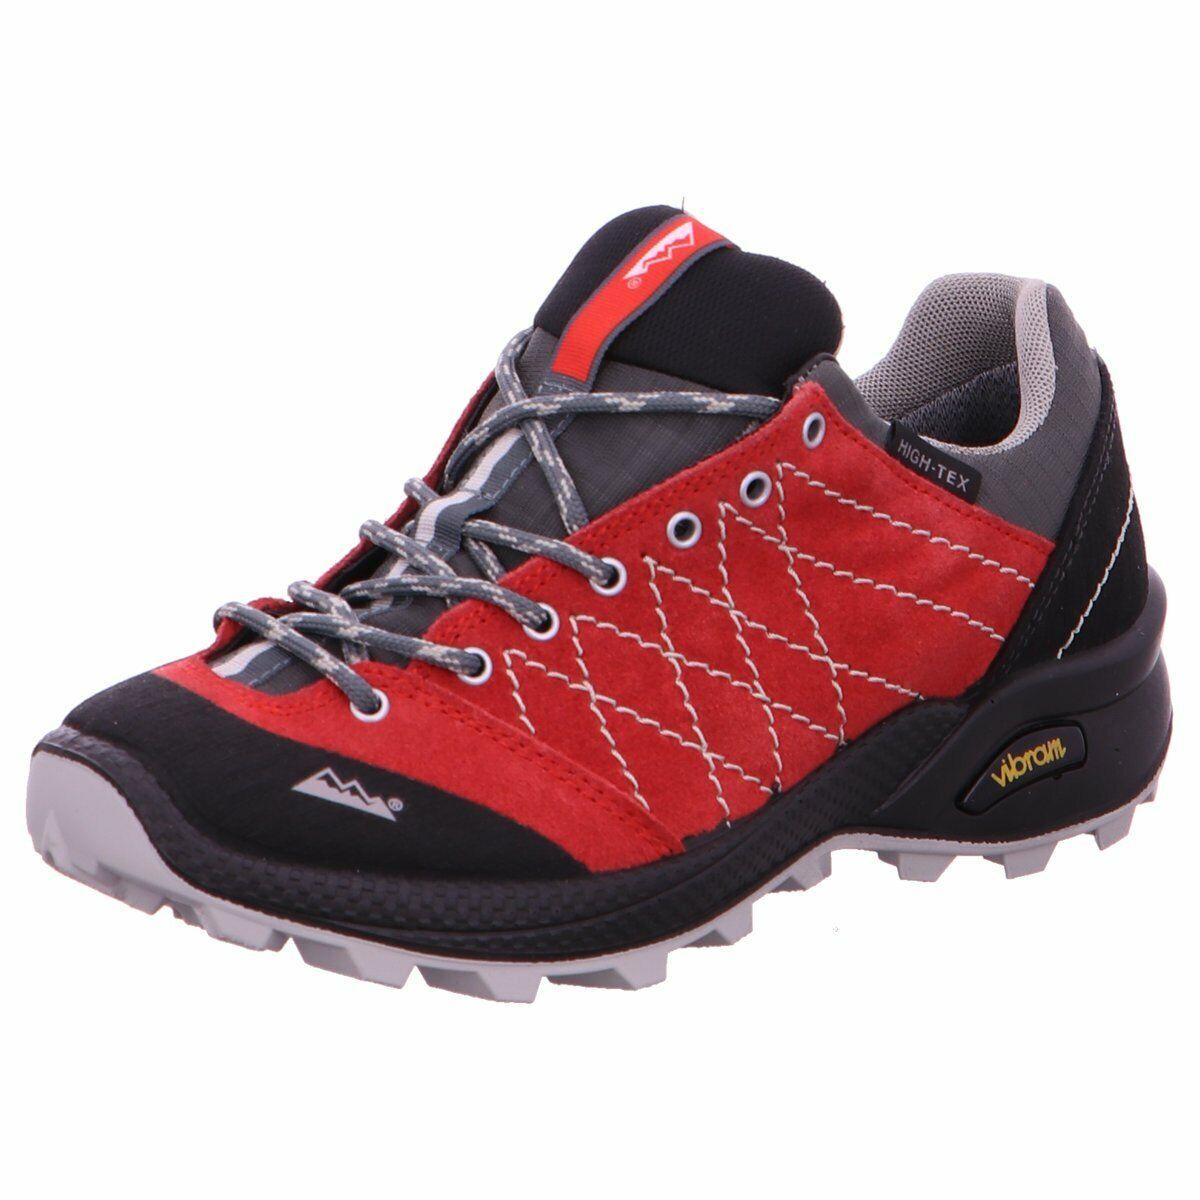 HIGH COLORADO Damen Sportschuhe Crest Trail Schnürschuh 1020819 rot 653234